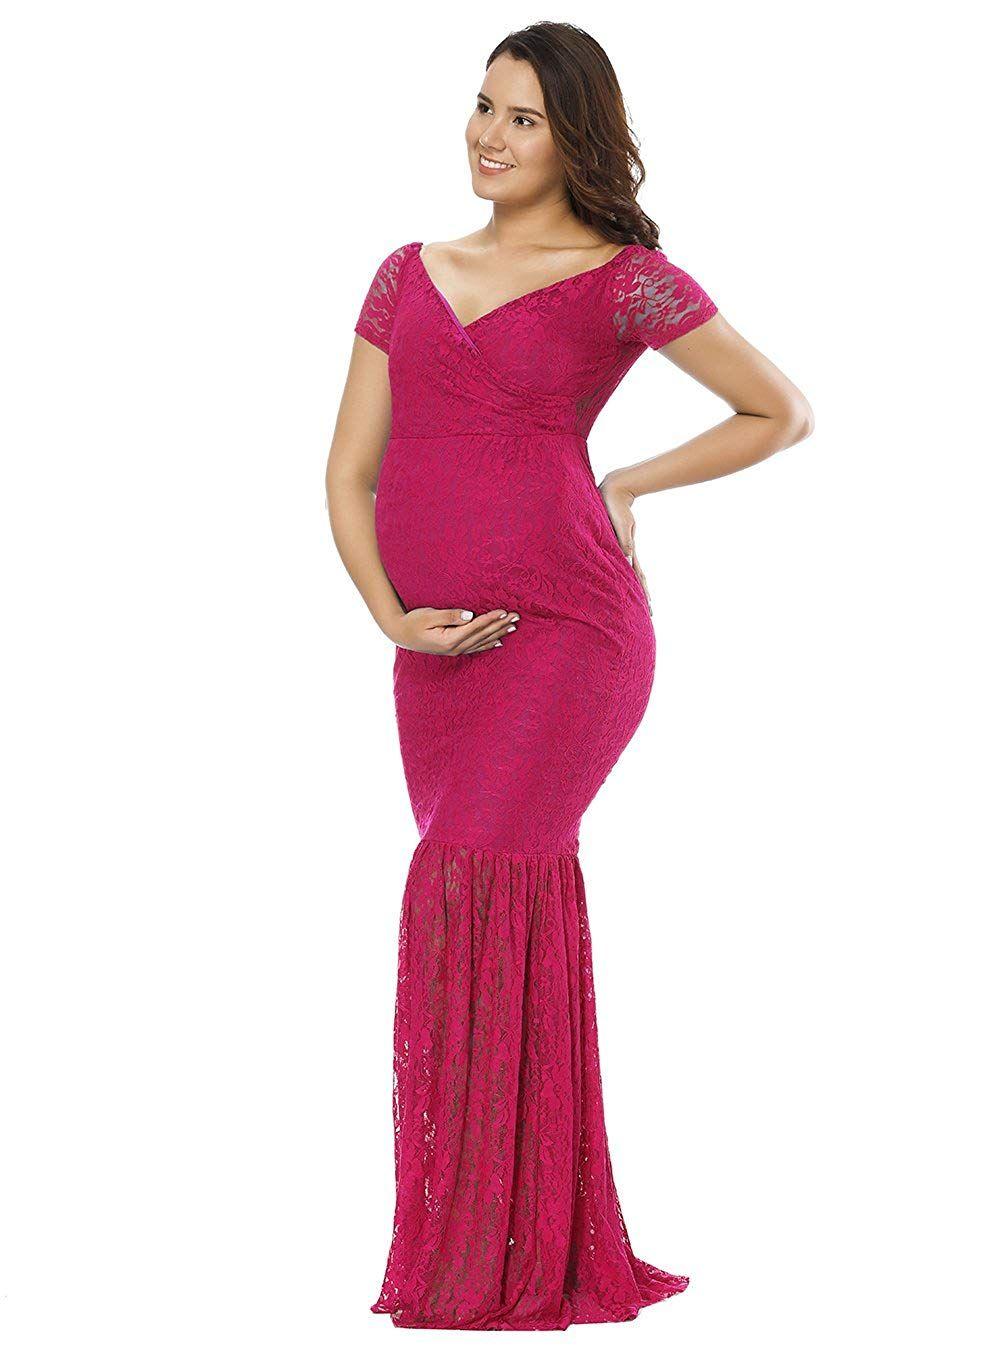 8c4808d758744 JustVH Women's Off Shoulder Short Sleeve V Neck Lace Maternity Gown Maxi  Photography Dress